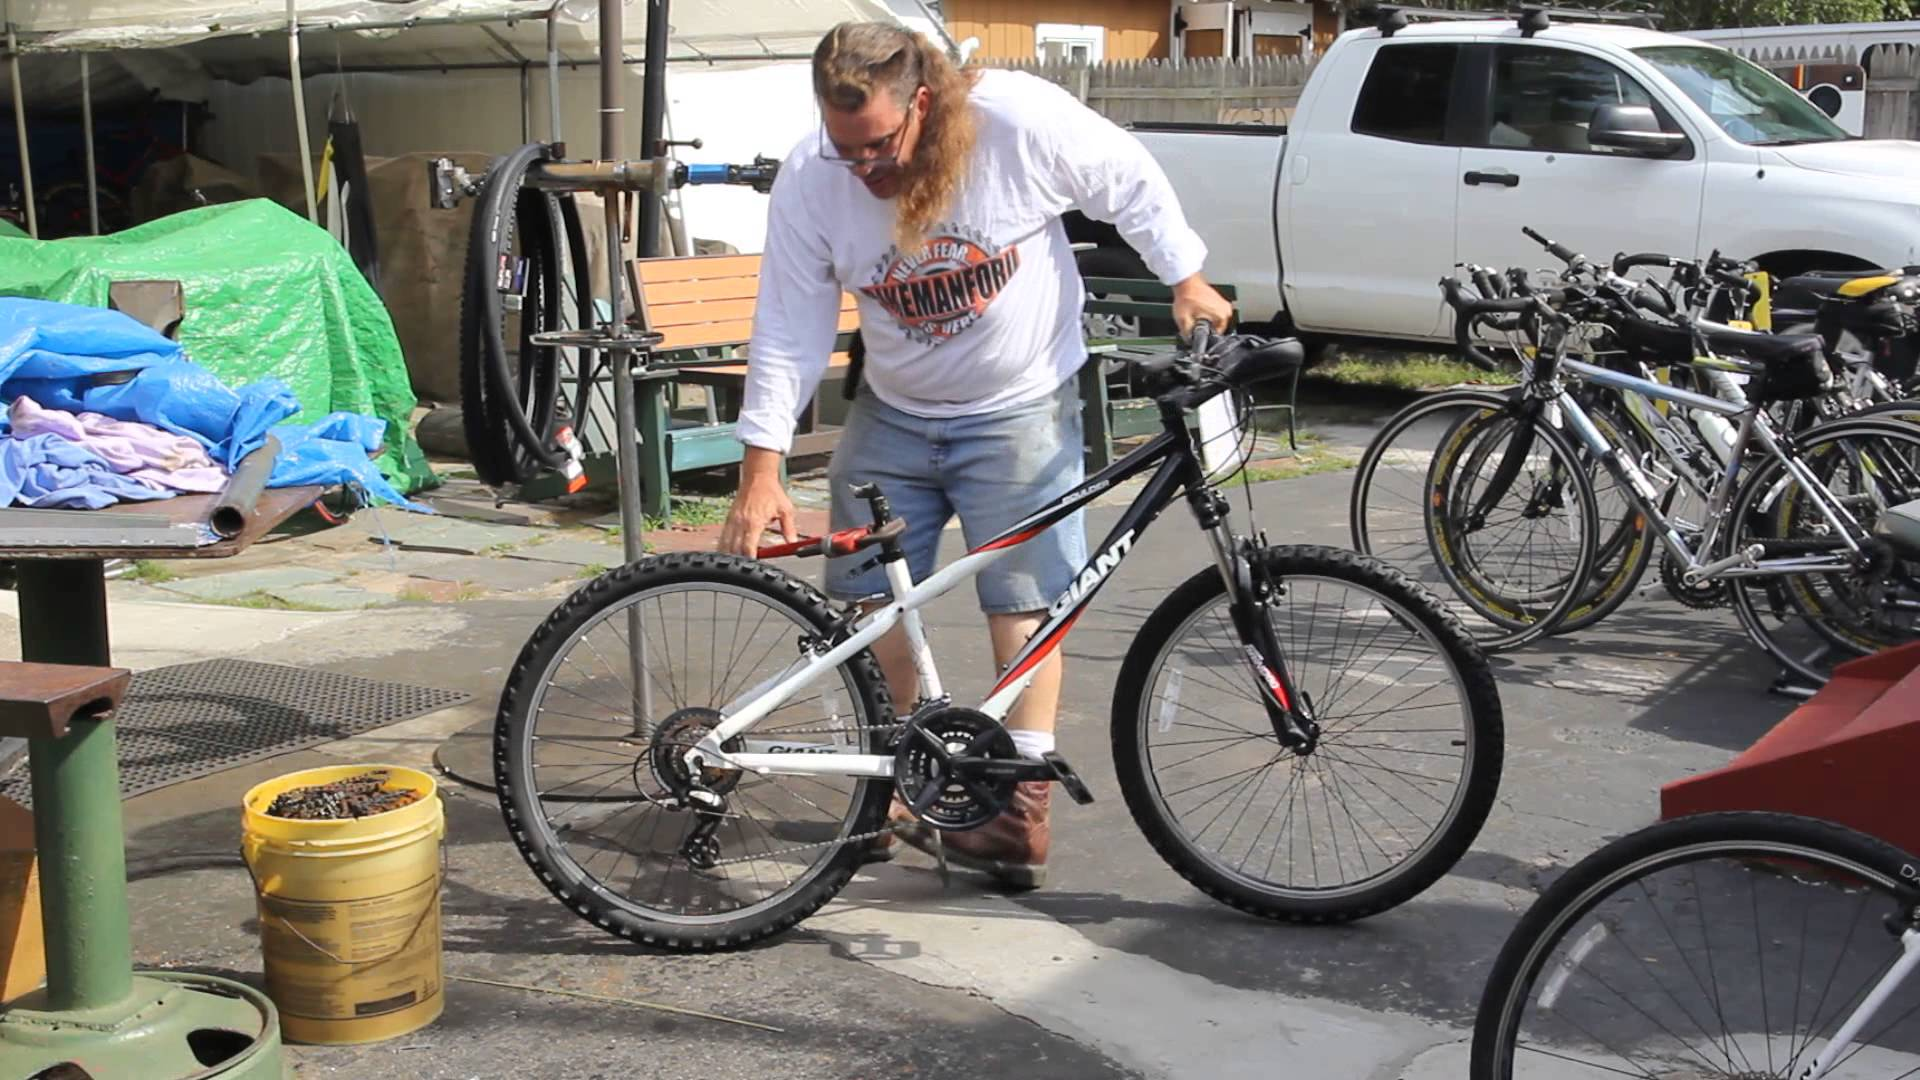 Stuck Seat Post - What Should I Do? Bicycle Repair - BikemanforU ...